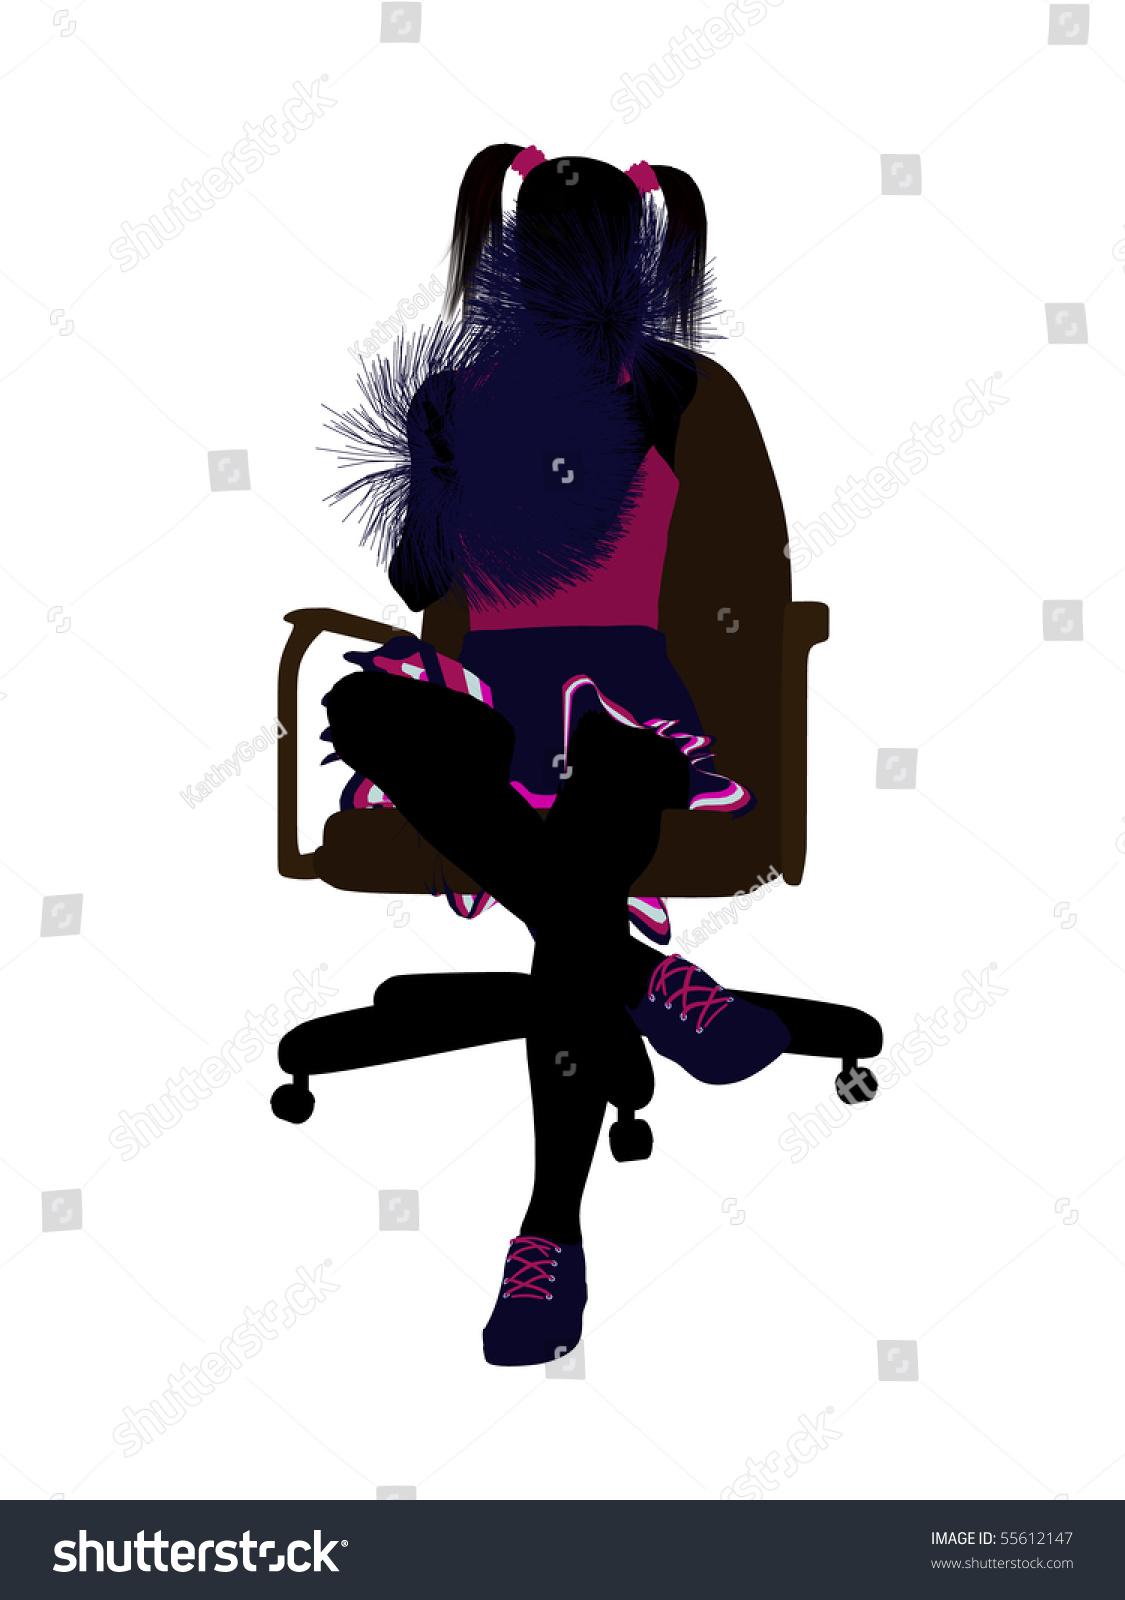 office chair illustration glider rocker covers cheerleader sitting on silhouette stock